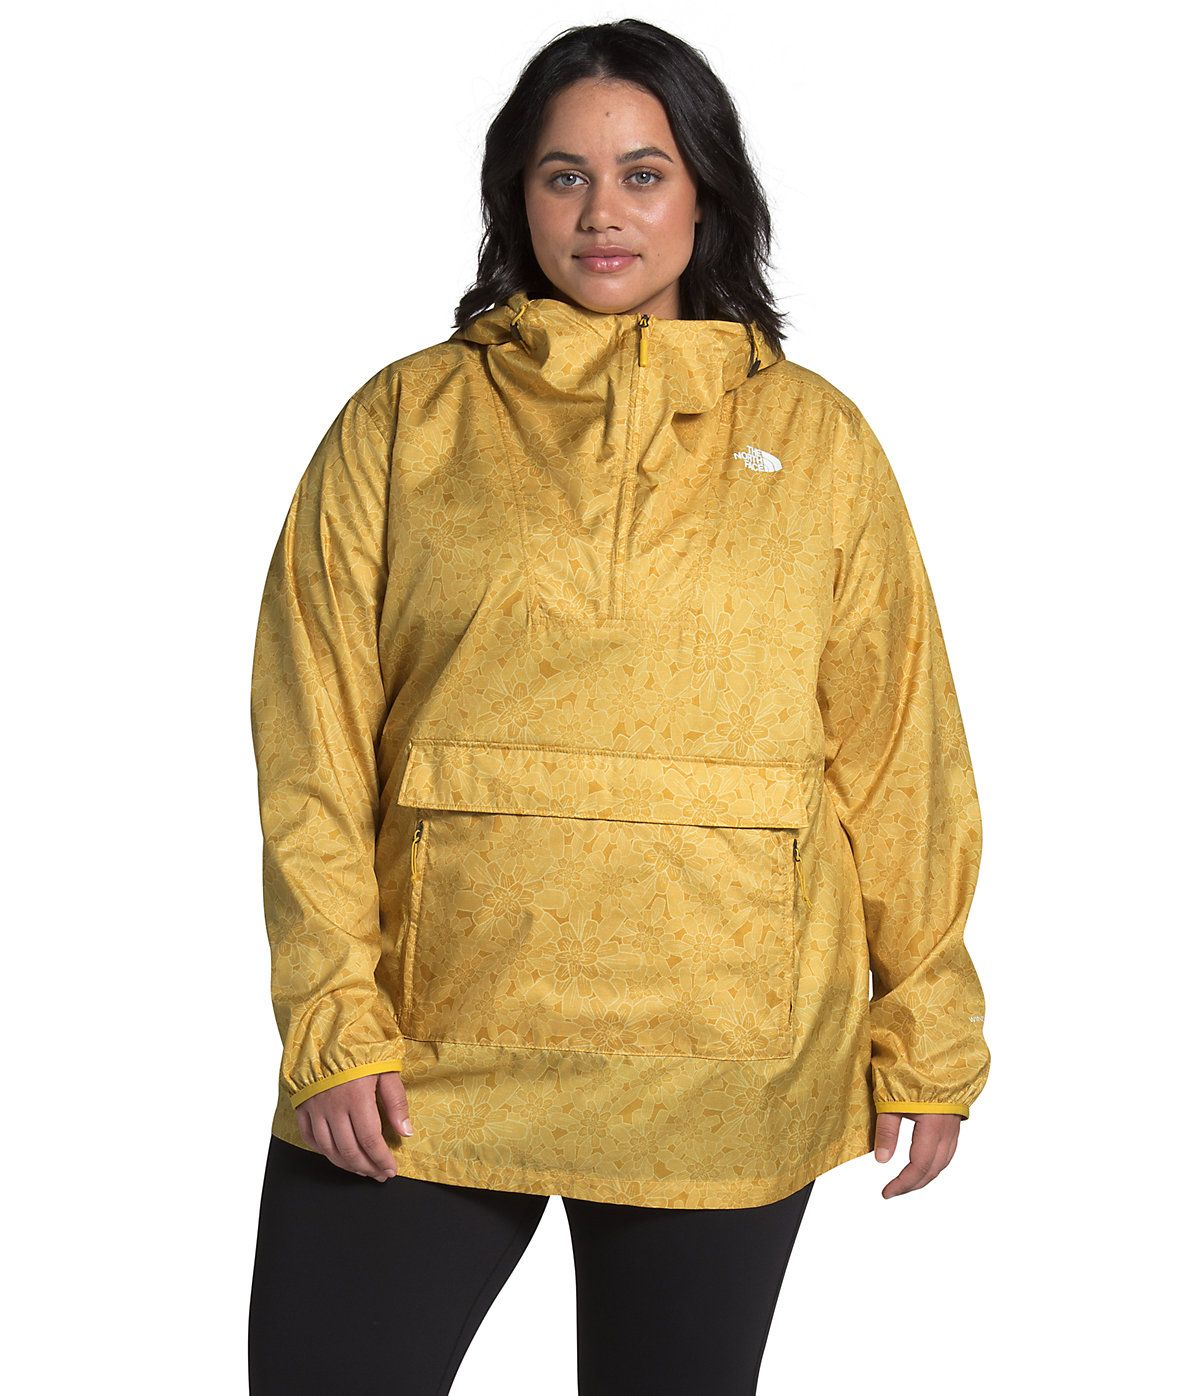 Women S Plus Printed Fanorak The North Face North Face Women The North Face Rainy Day Outfit [ 1396 x 1200 Pixel ]